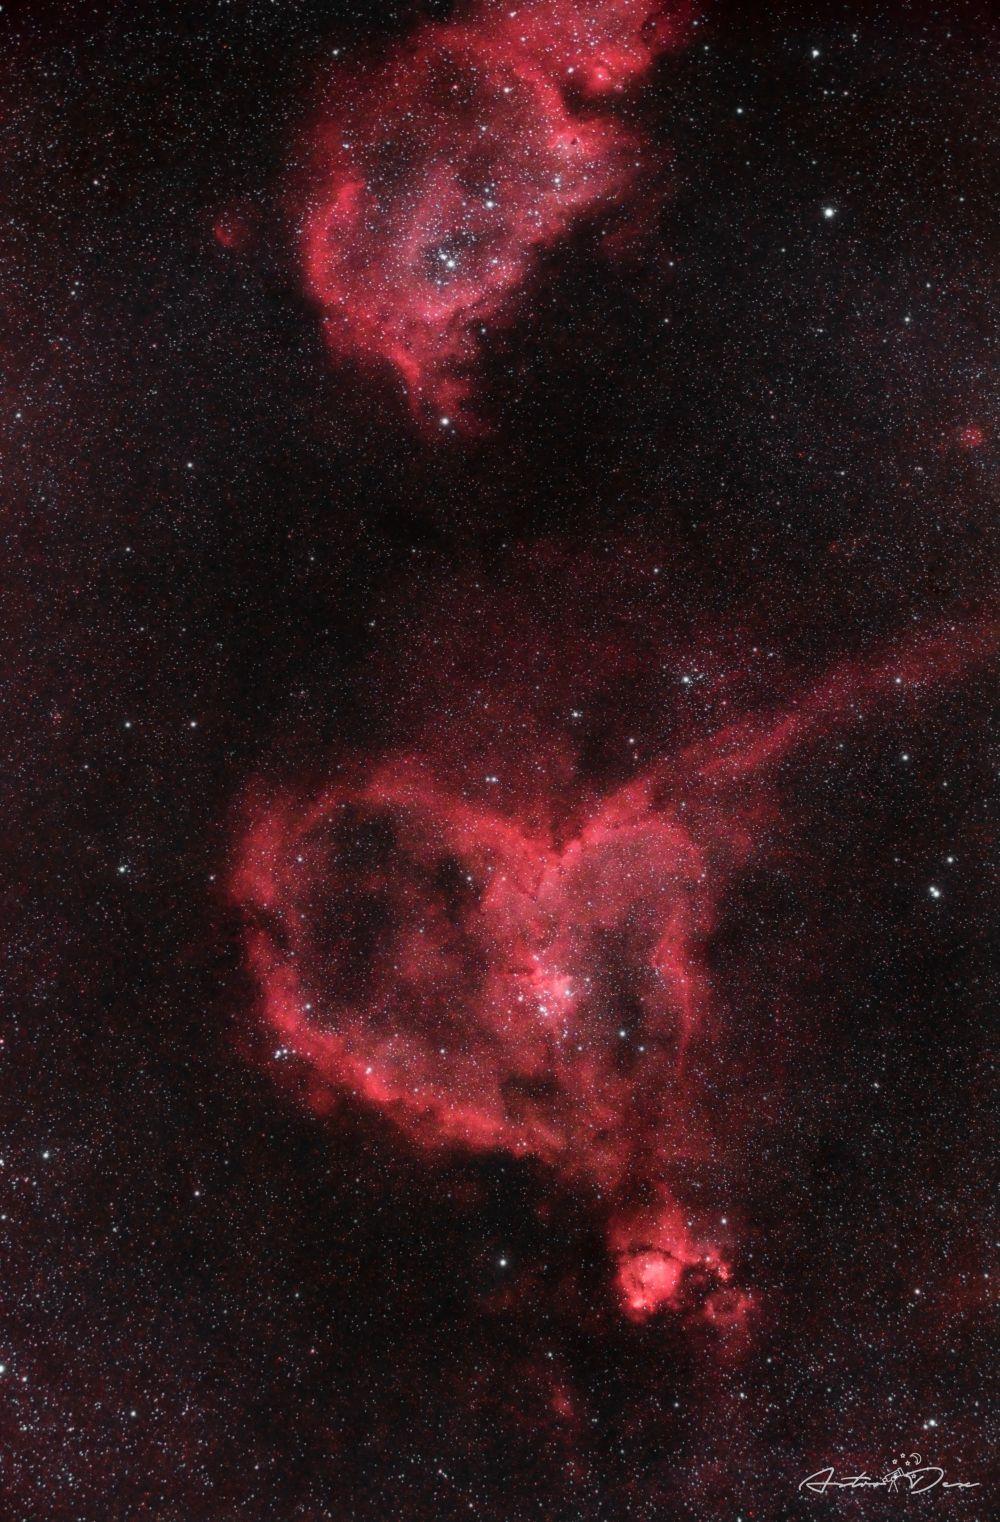 IC1805 & IC1848 - The Heart and Soul Nebulae